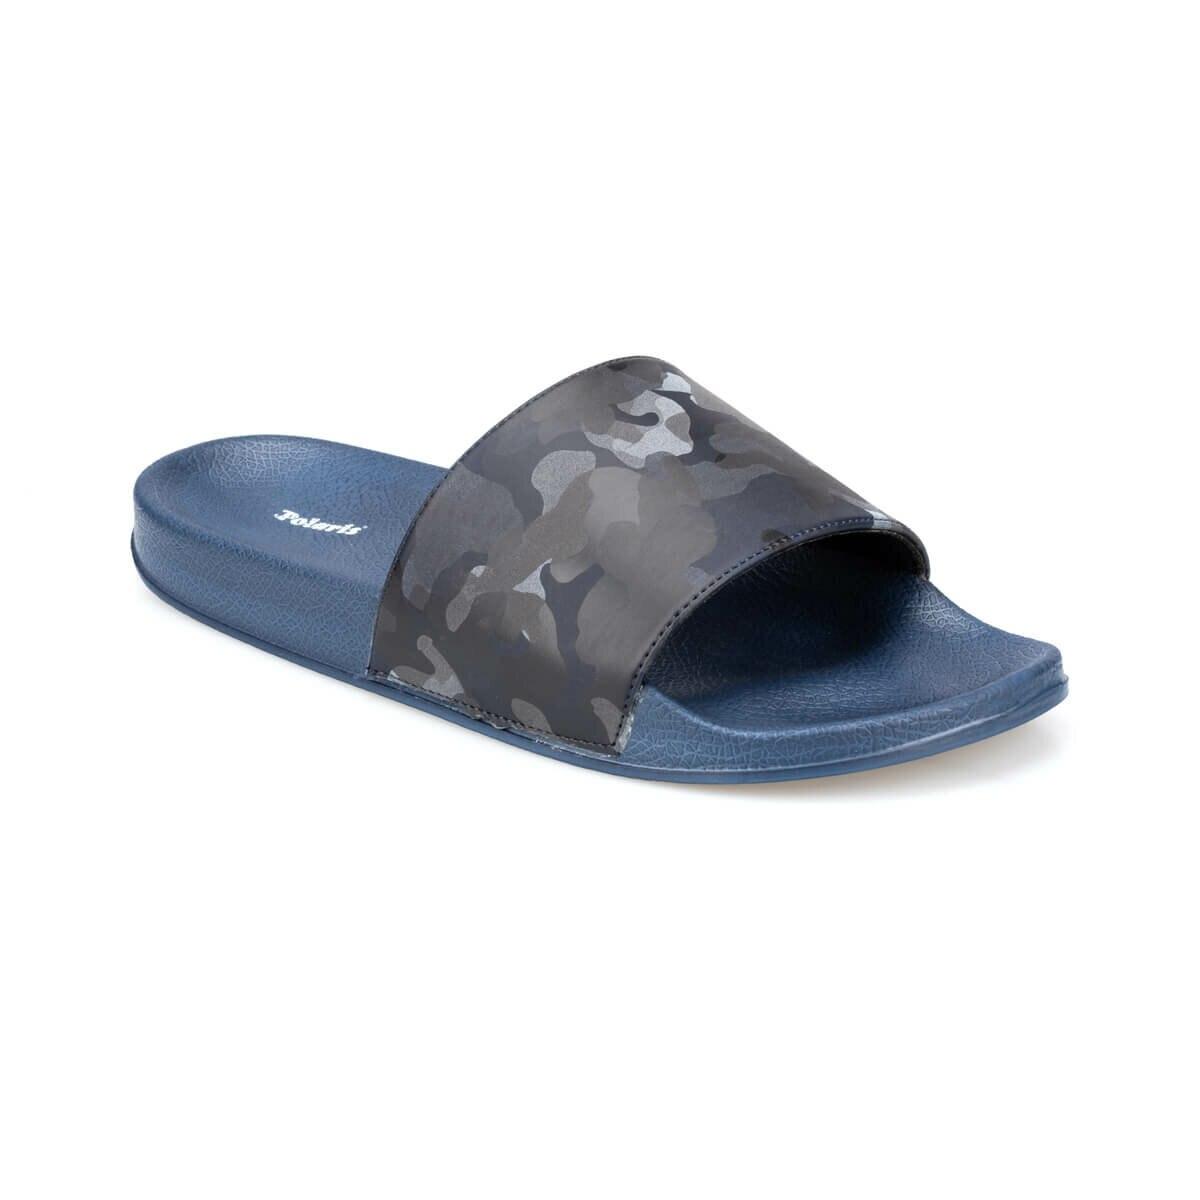 FLO 91.400069.M Navy Blue Male Slippers Polaris